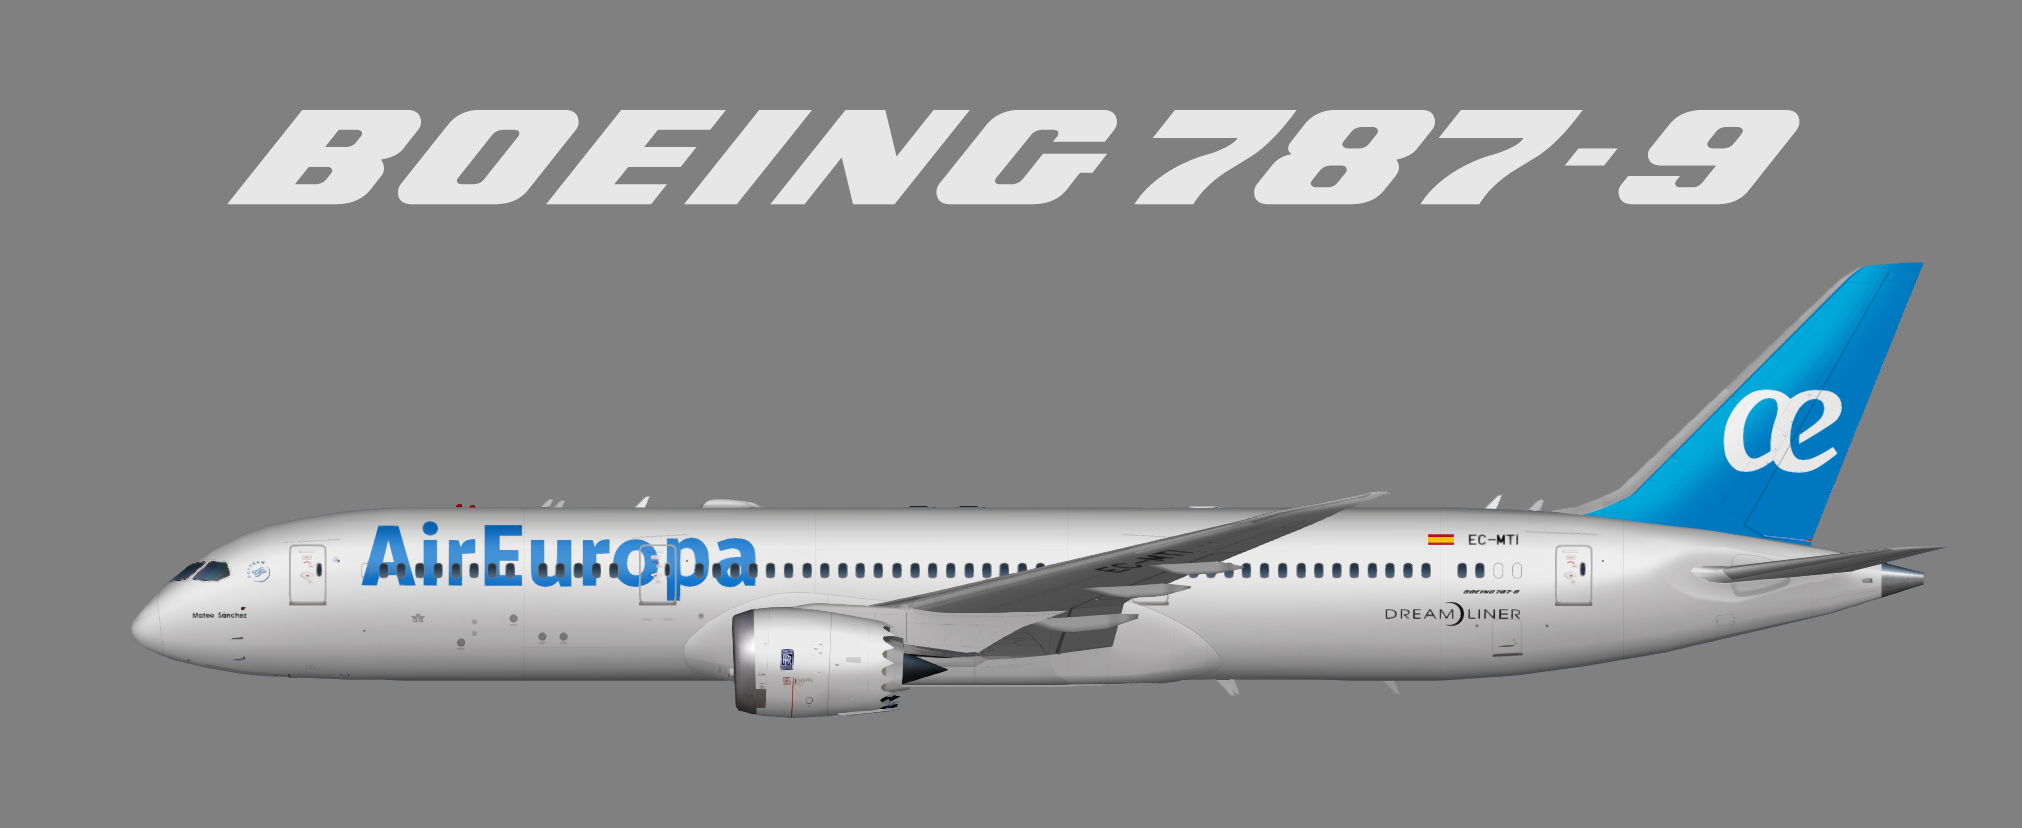 Air Europa Boeing 787-9 (UTT)